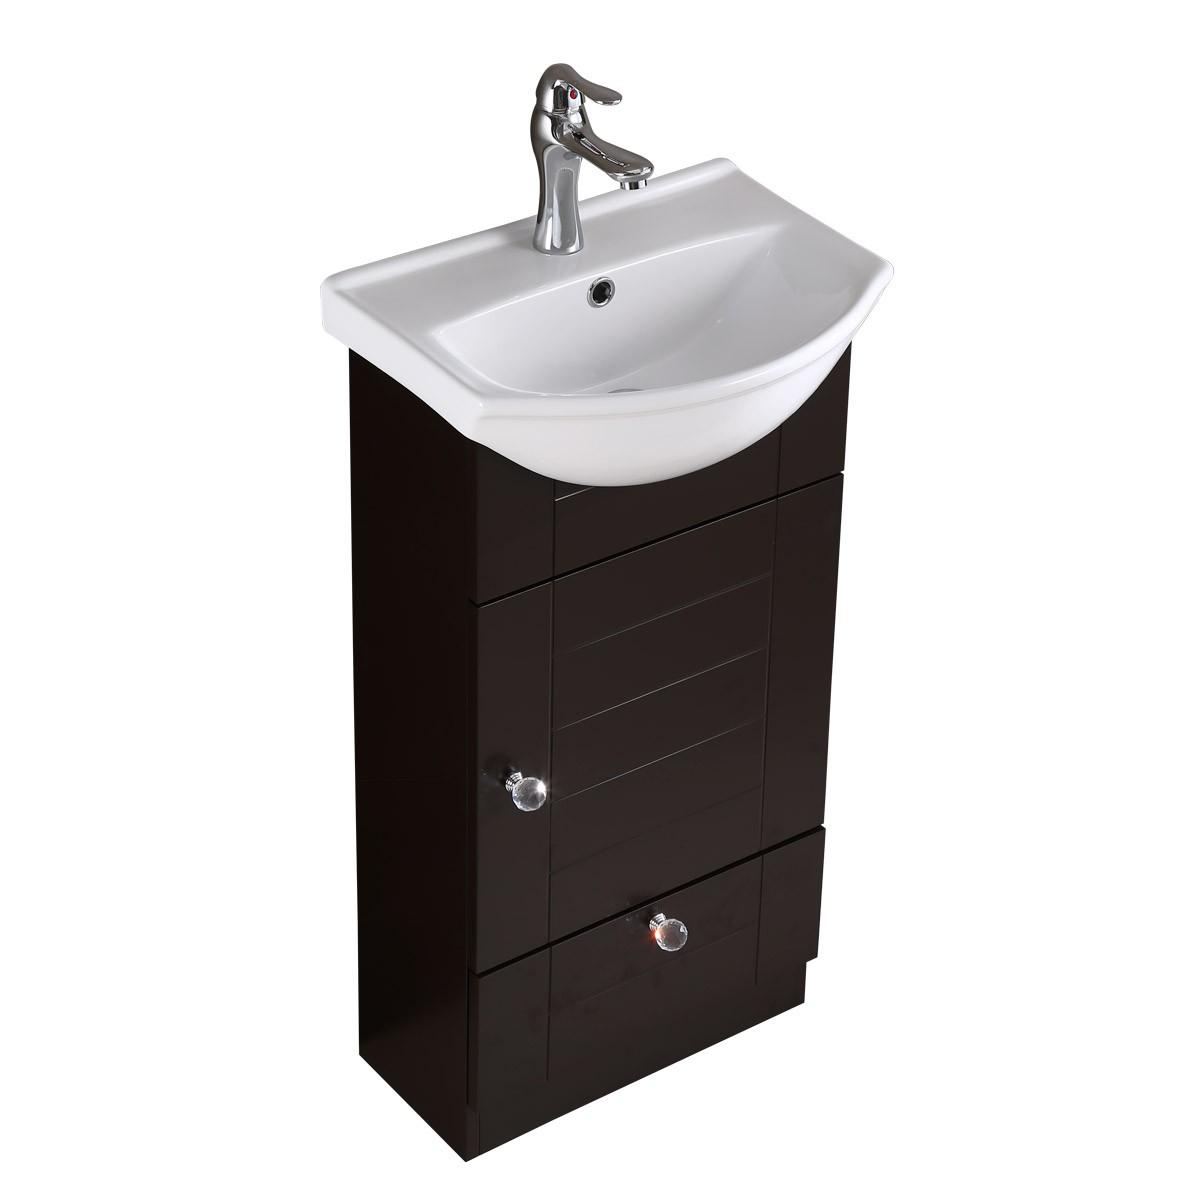 Renovators Supply Small Bathroom White and Black Vanity Cabinet Sink Bathroom Cabinet Sink Vanity Sinks For Bathrooms Wall Mount Cabinet Sink